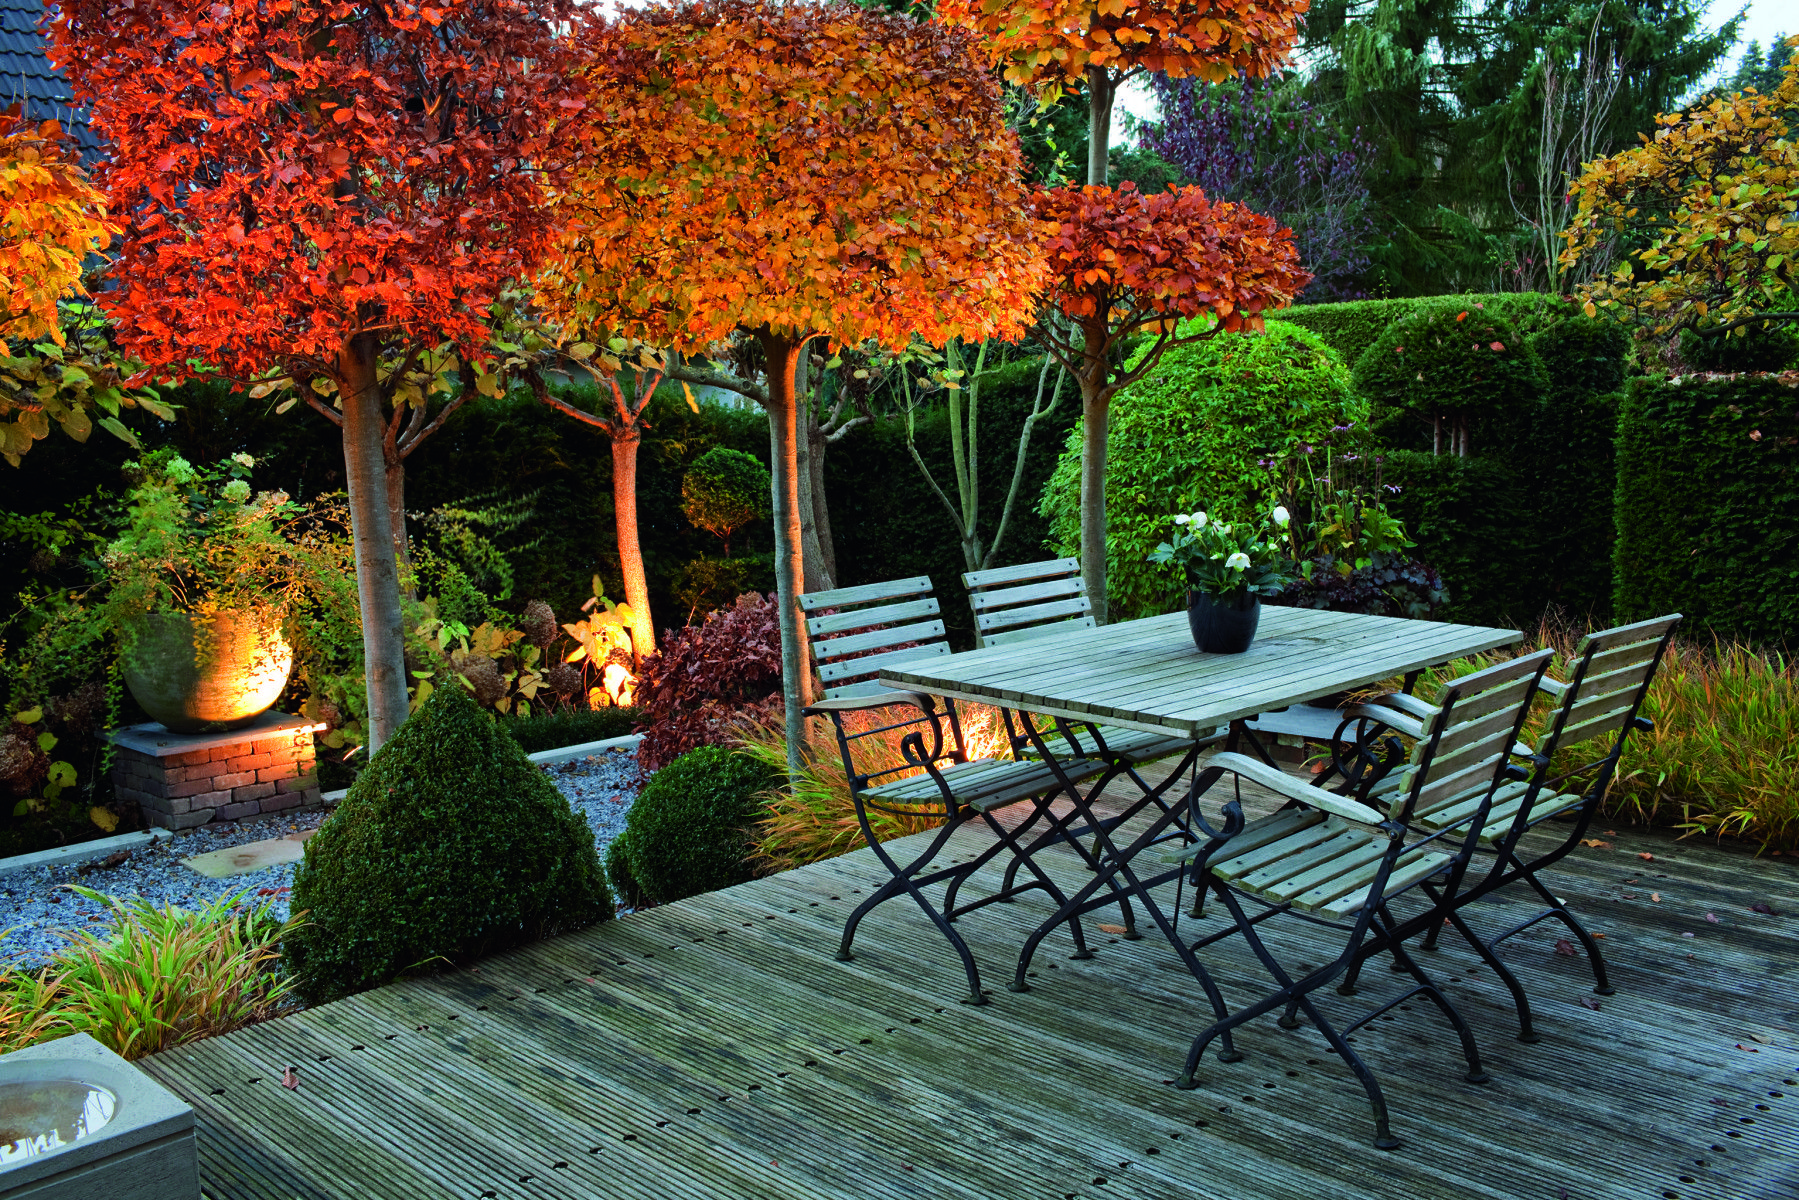 Bildergebnis fr gartengestaltung ideen reihenhausgarten